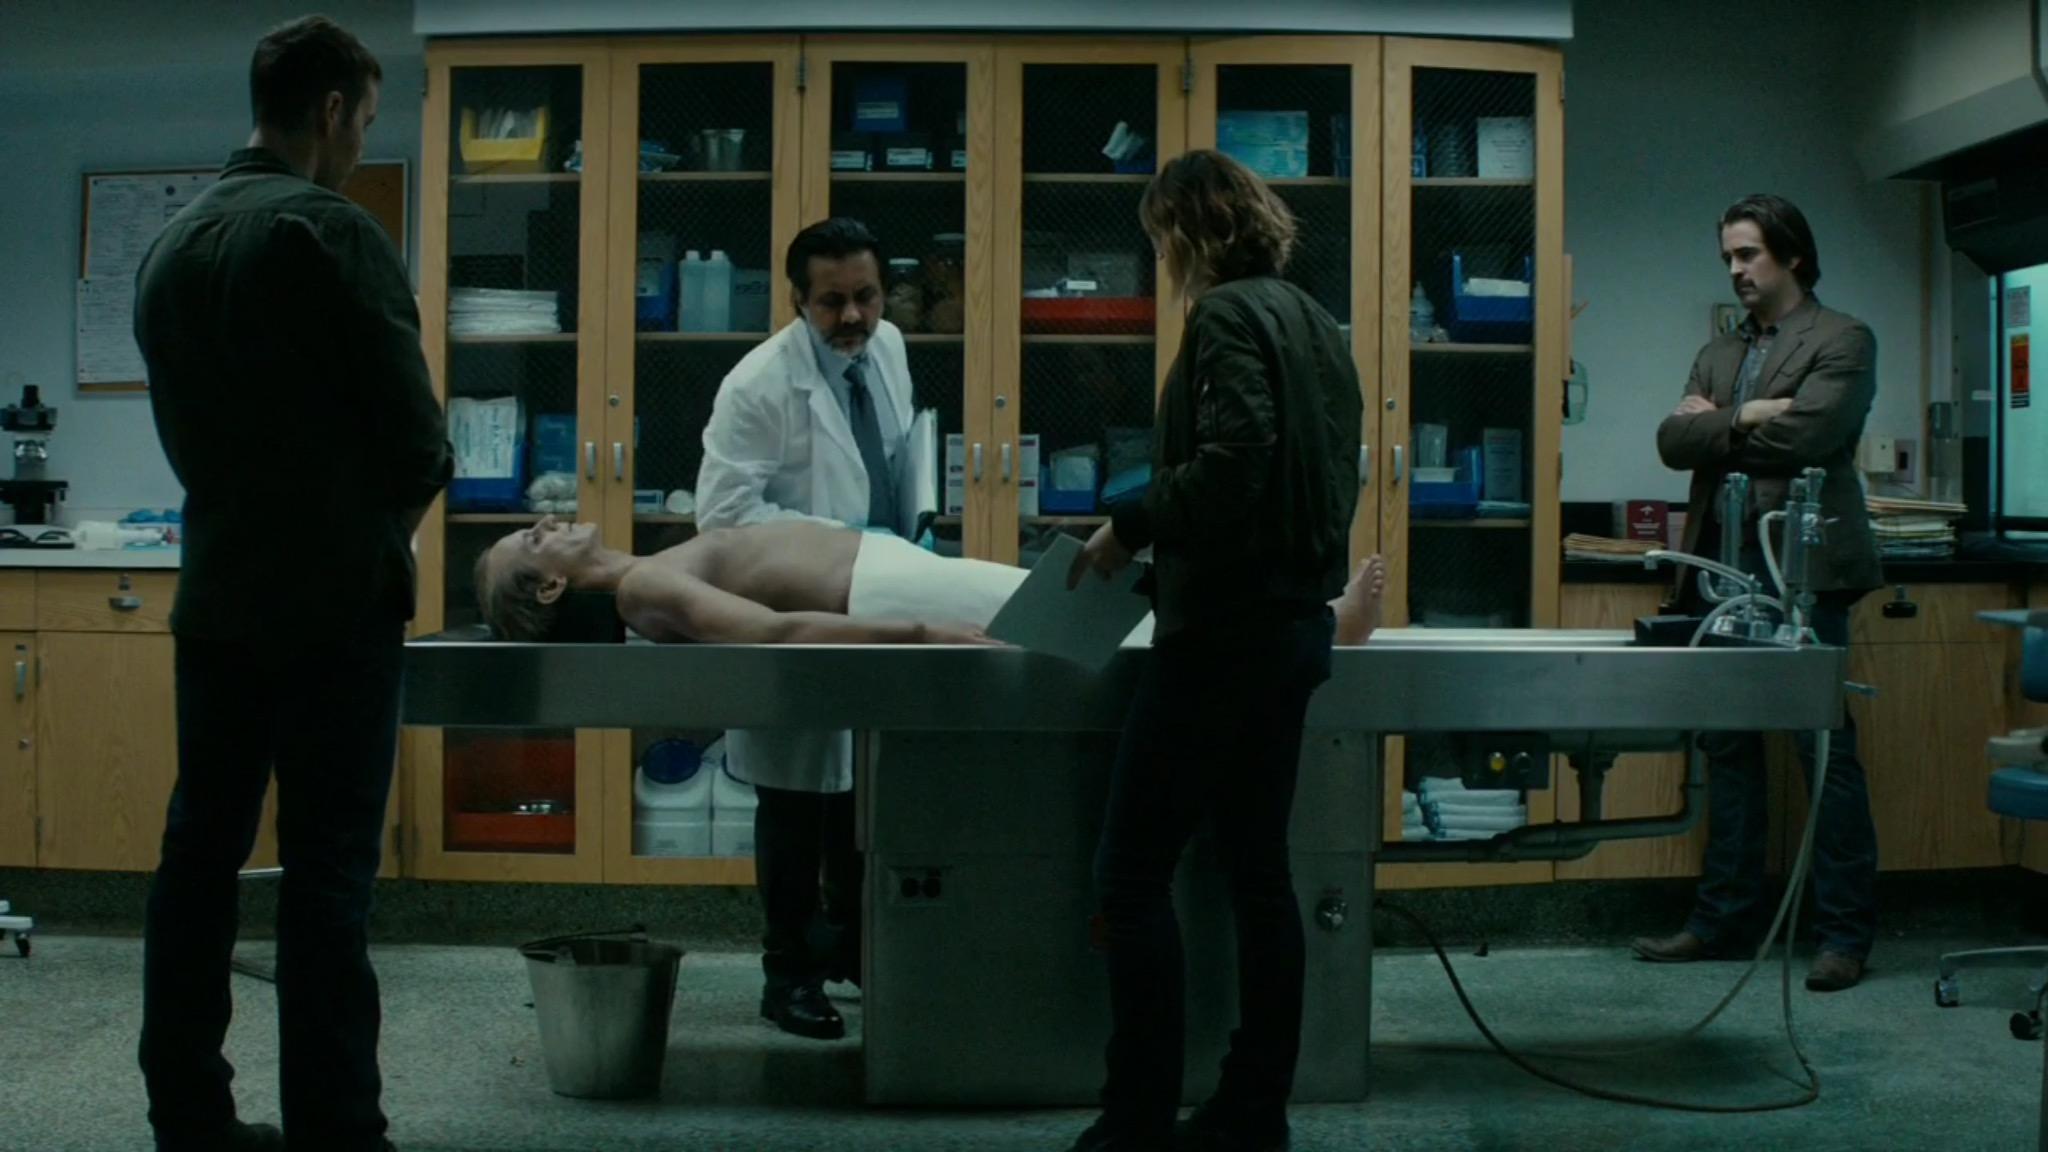 The coroner's office